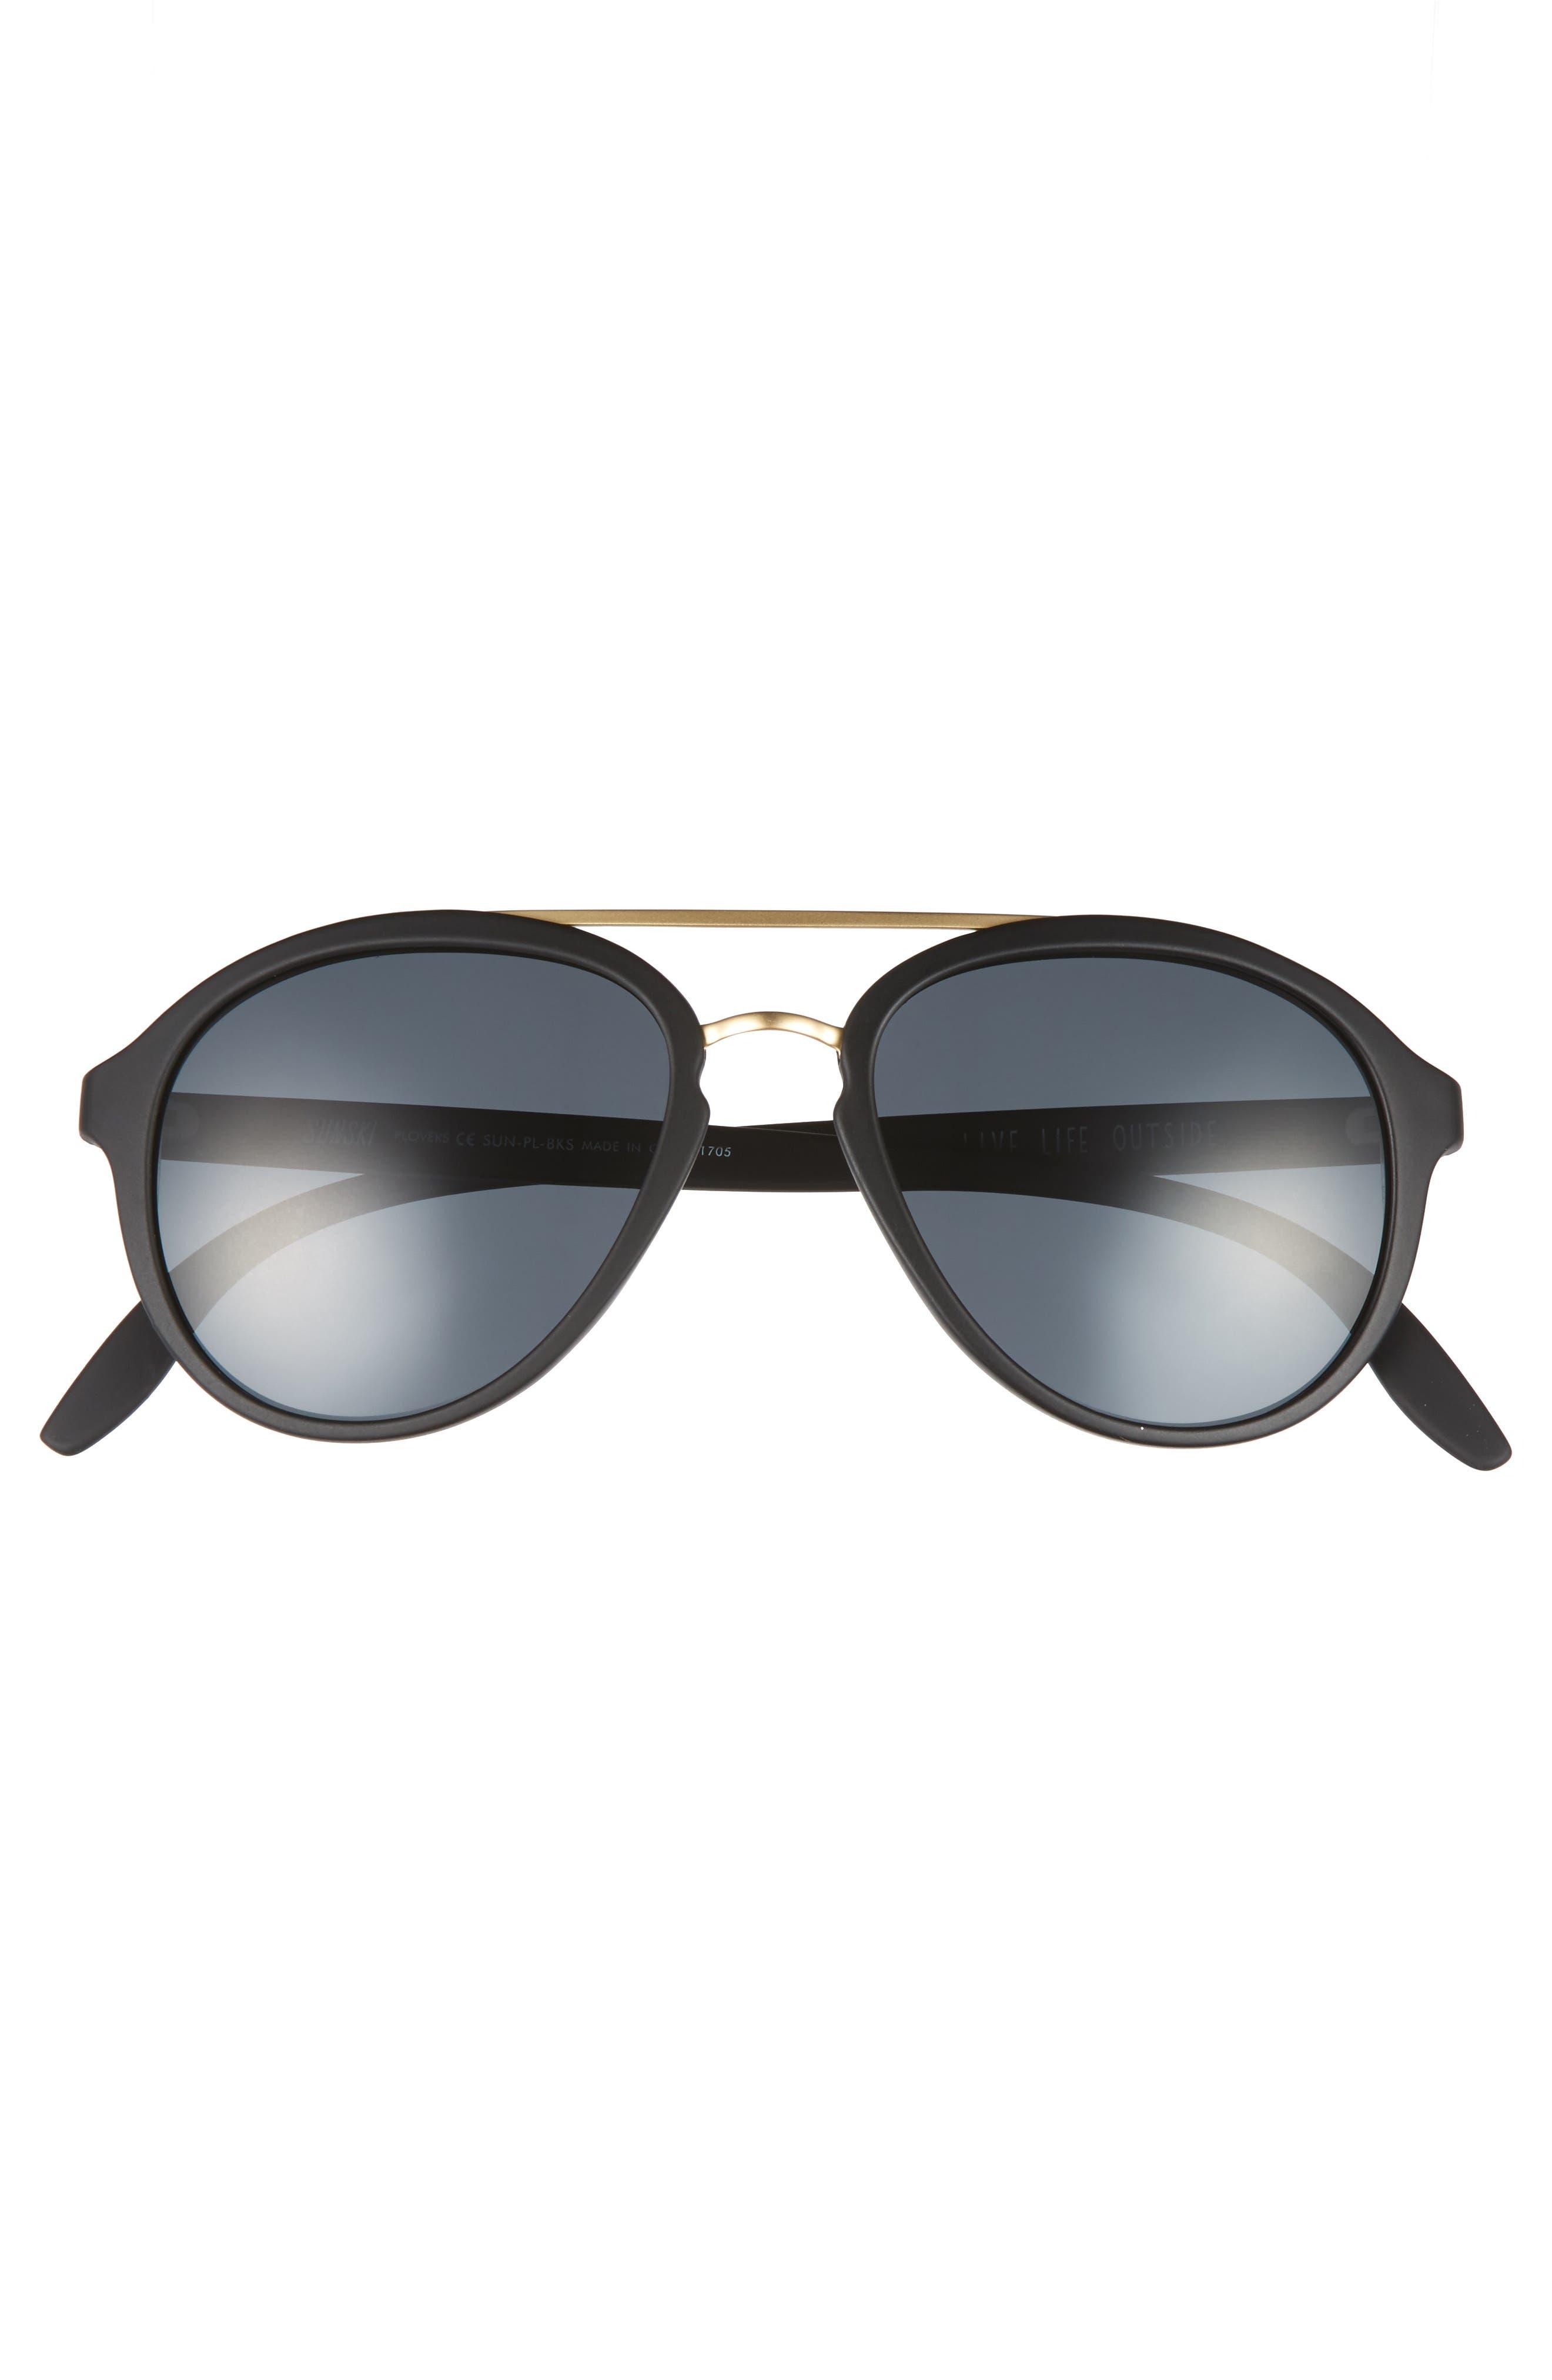 Plover 60mm Polarized Sunglasses,                             Alternate thumbnail 2, color,                             BLACK/ SLATE